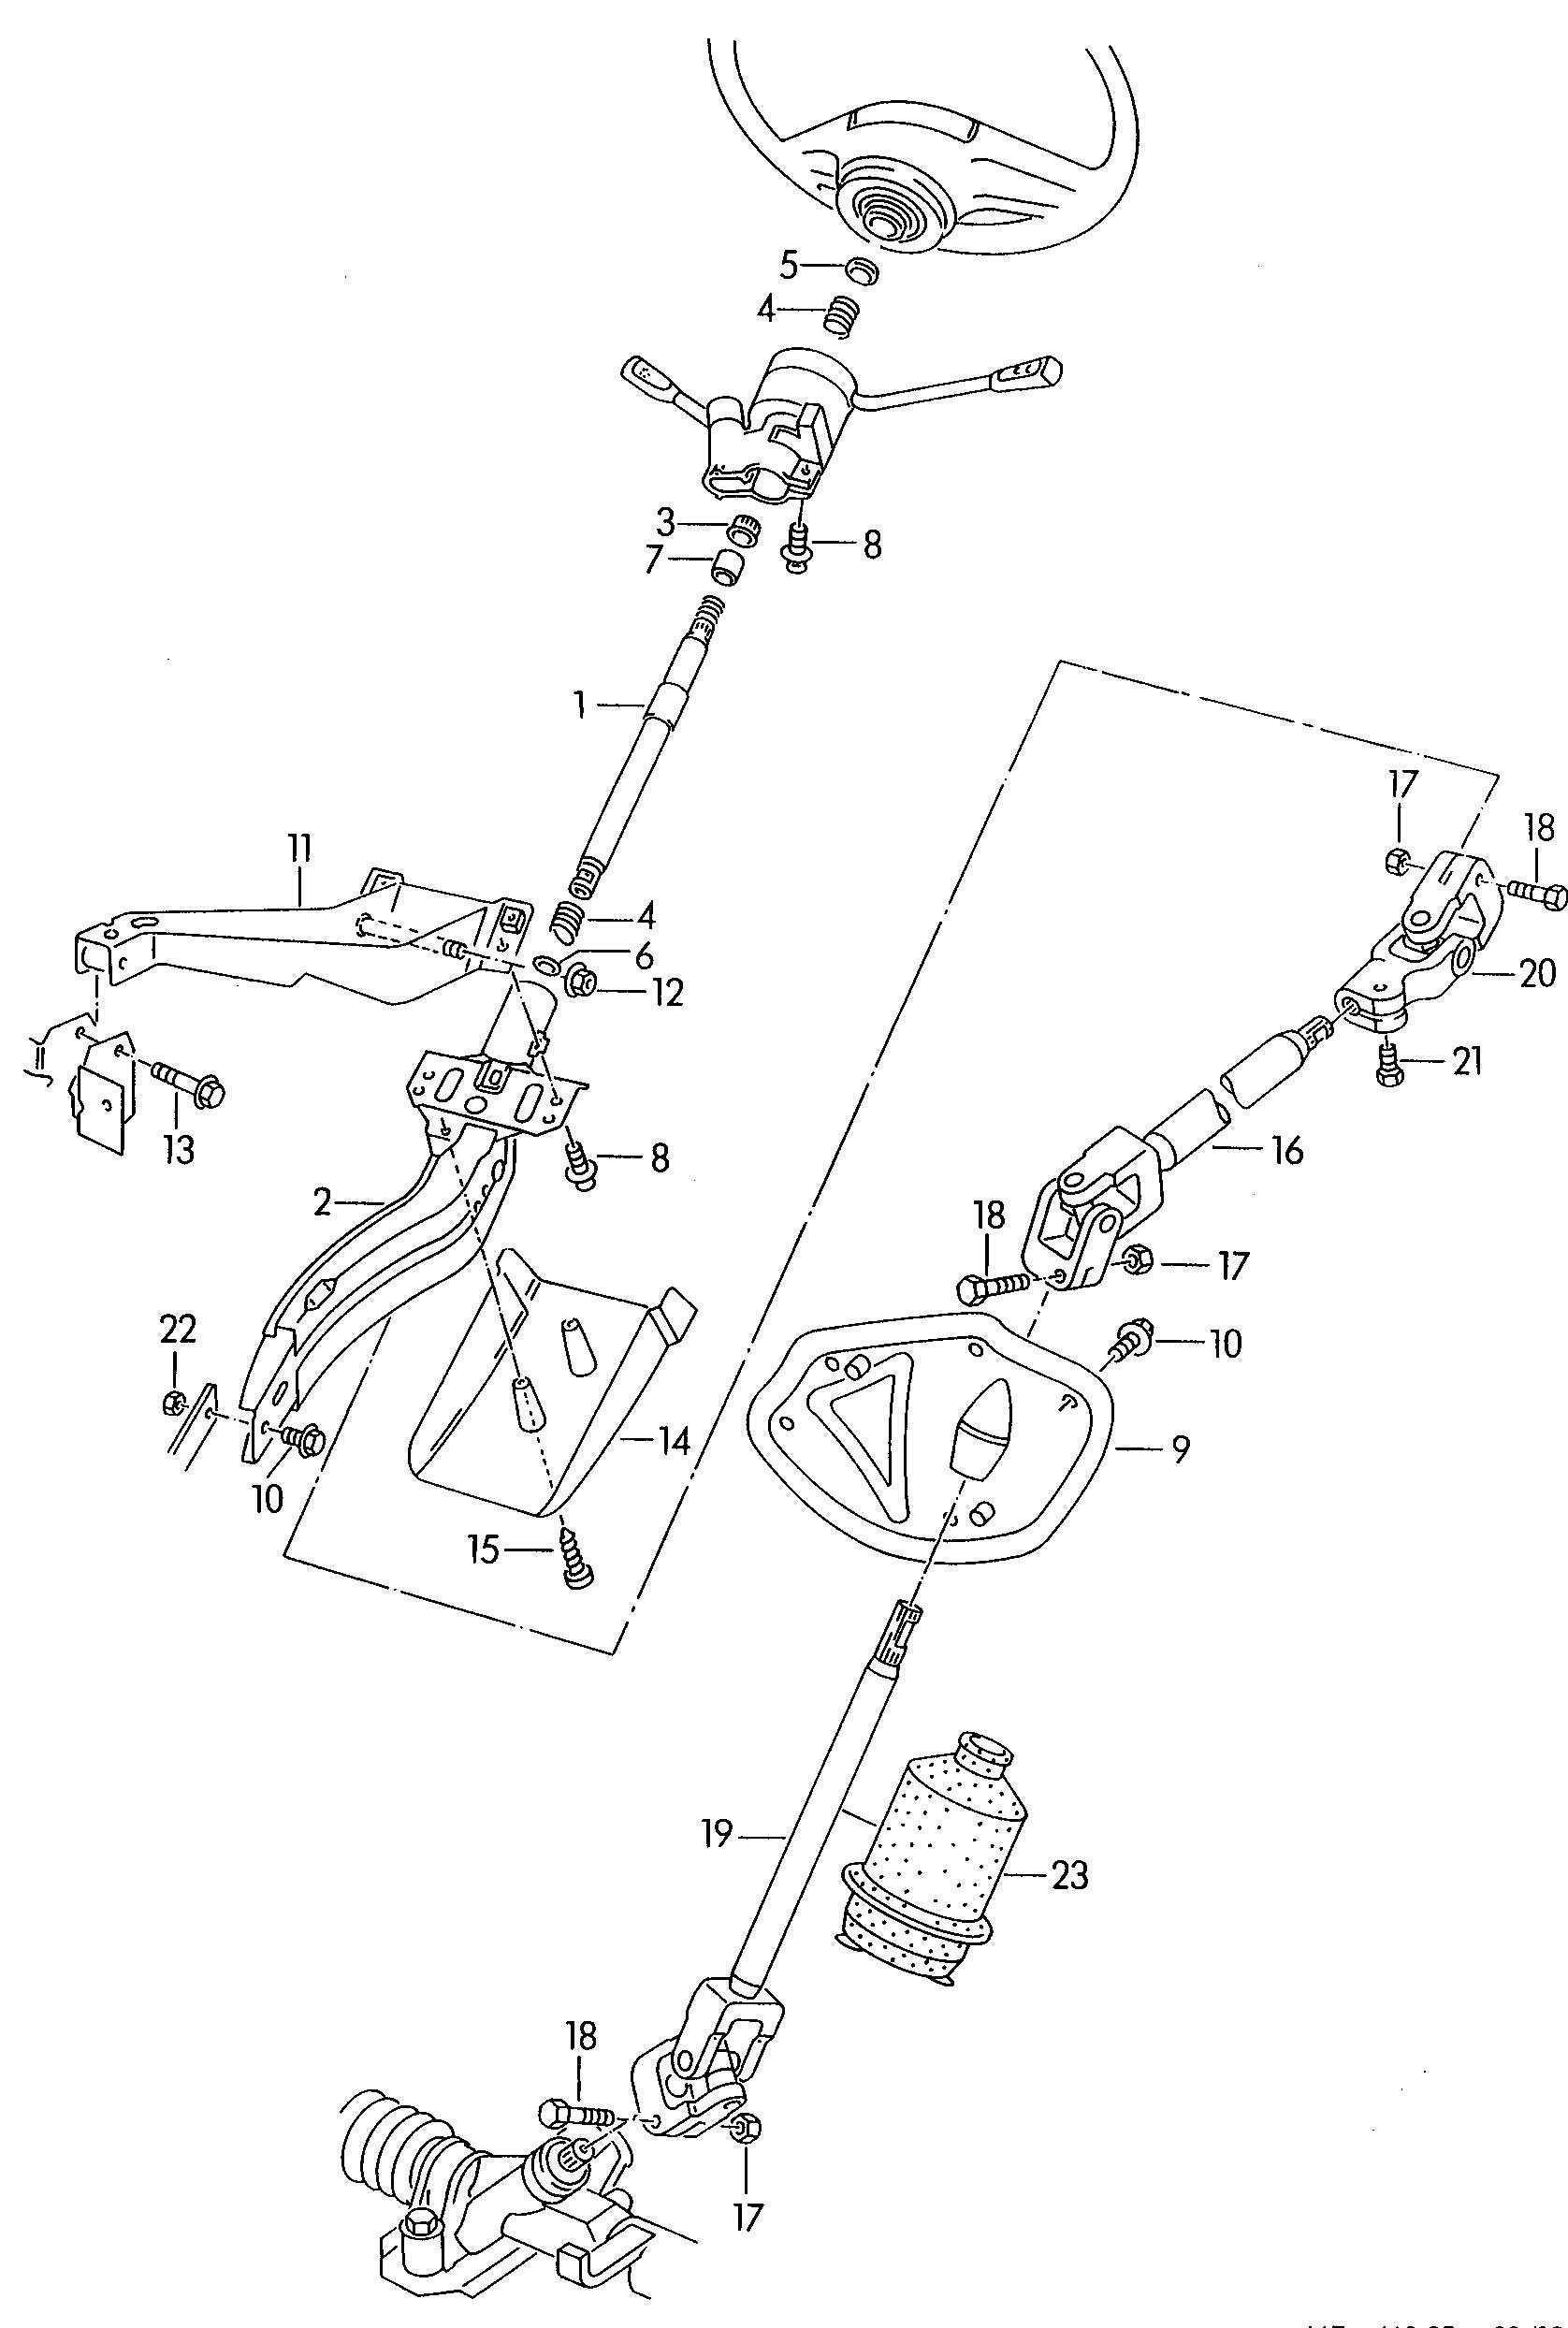 1992 volkswagen golf wiring harness